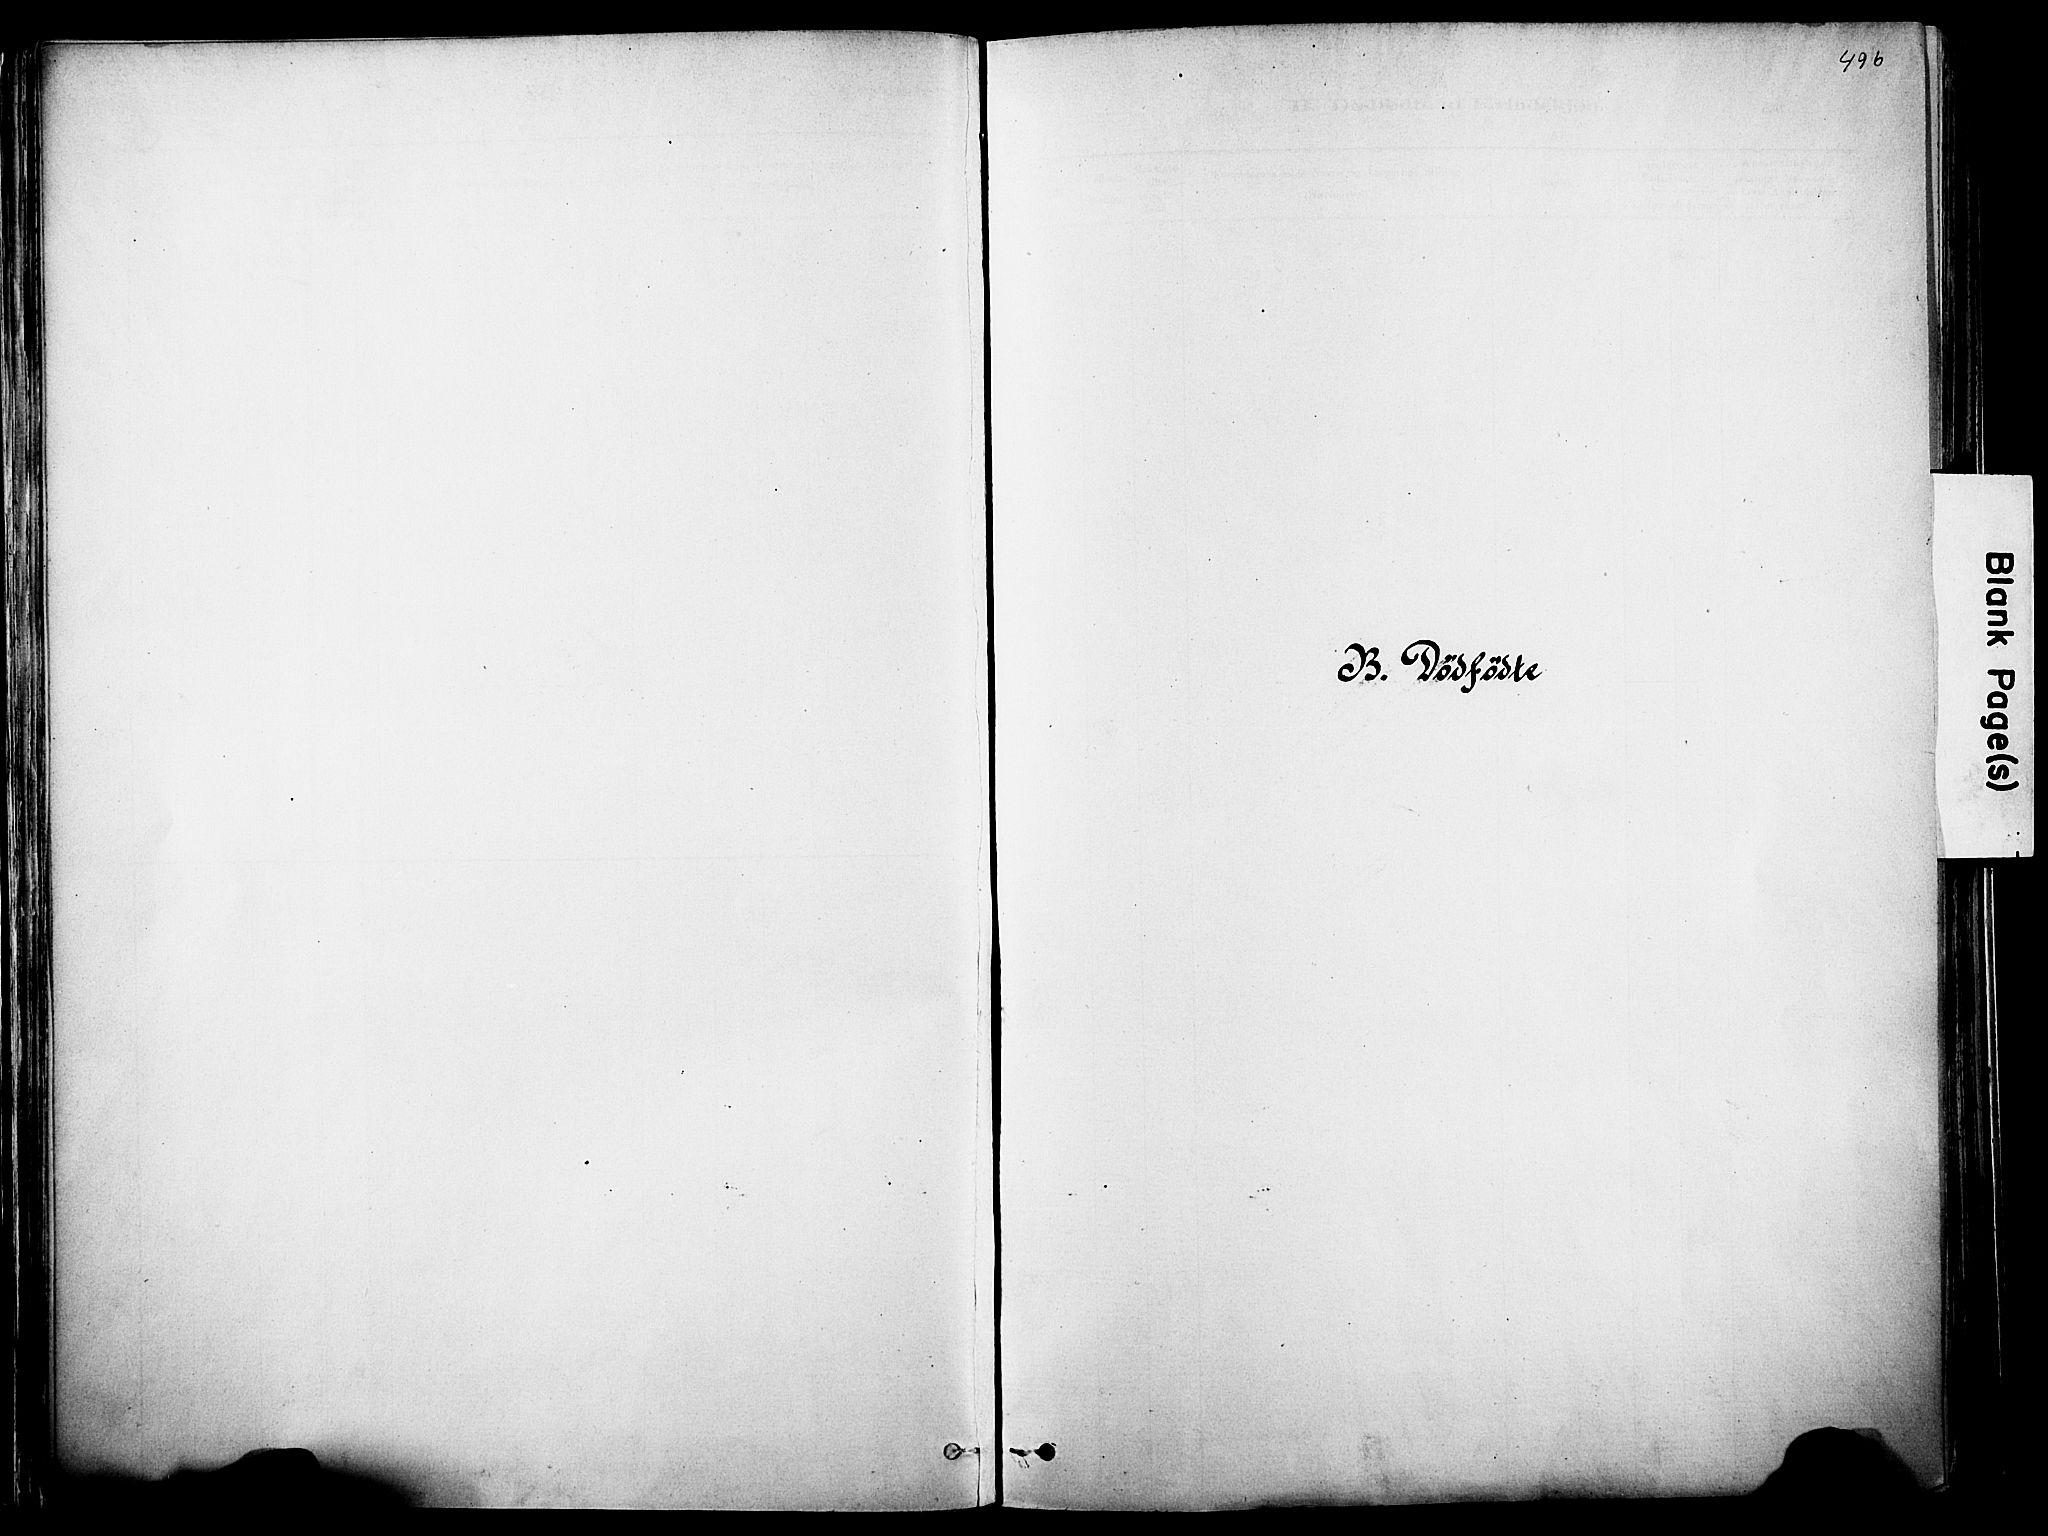 SAH, Vågå prestekontor, Ministerialbok nr. 10, 1887-1904, s. 49